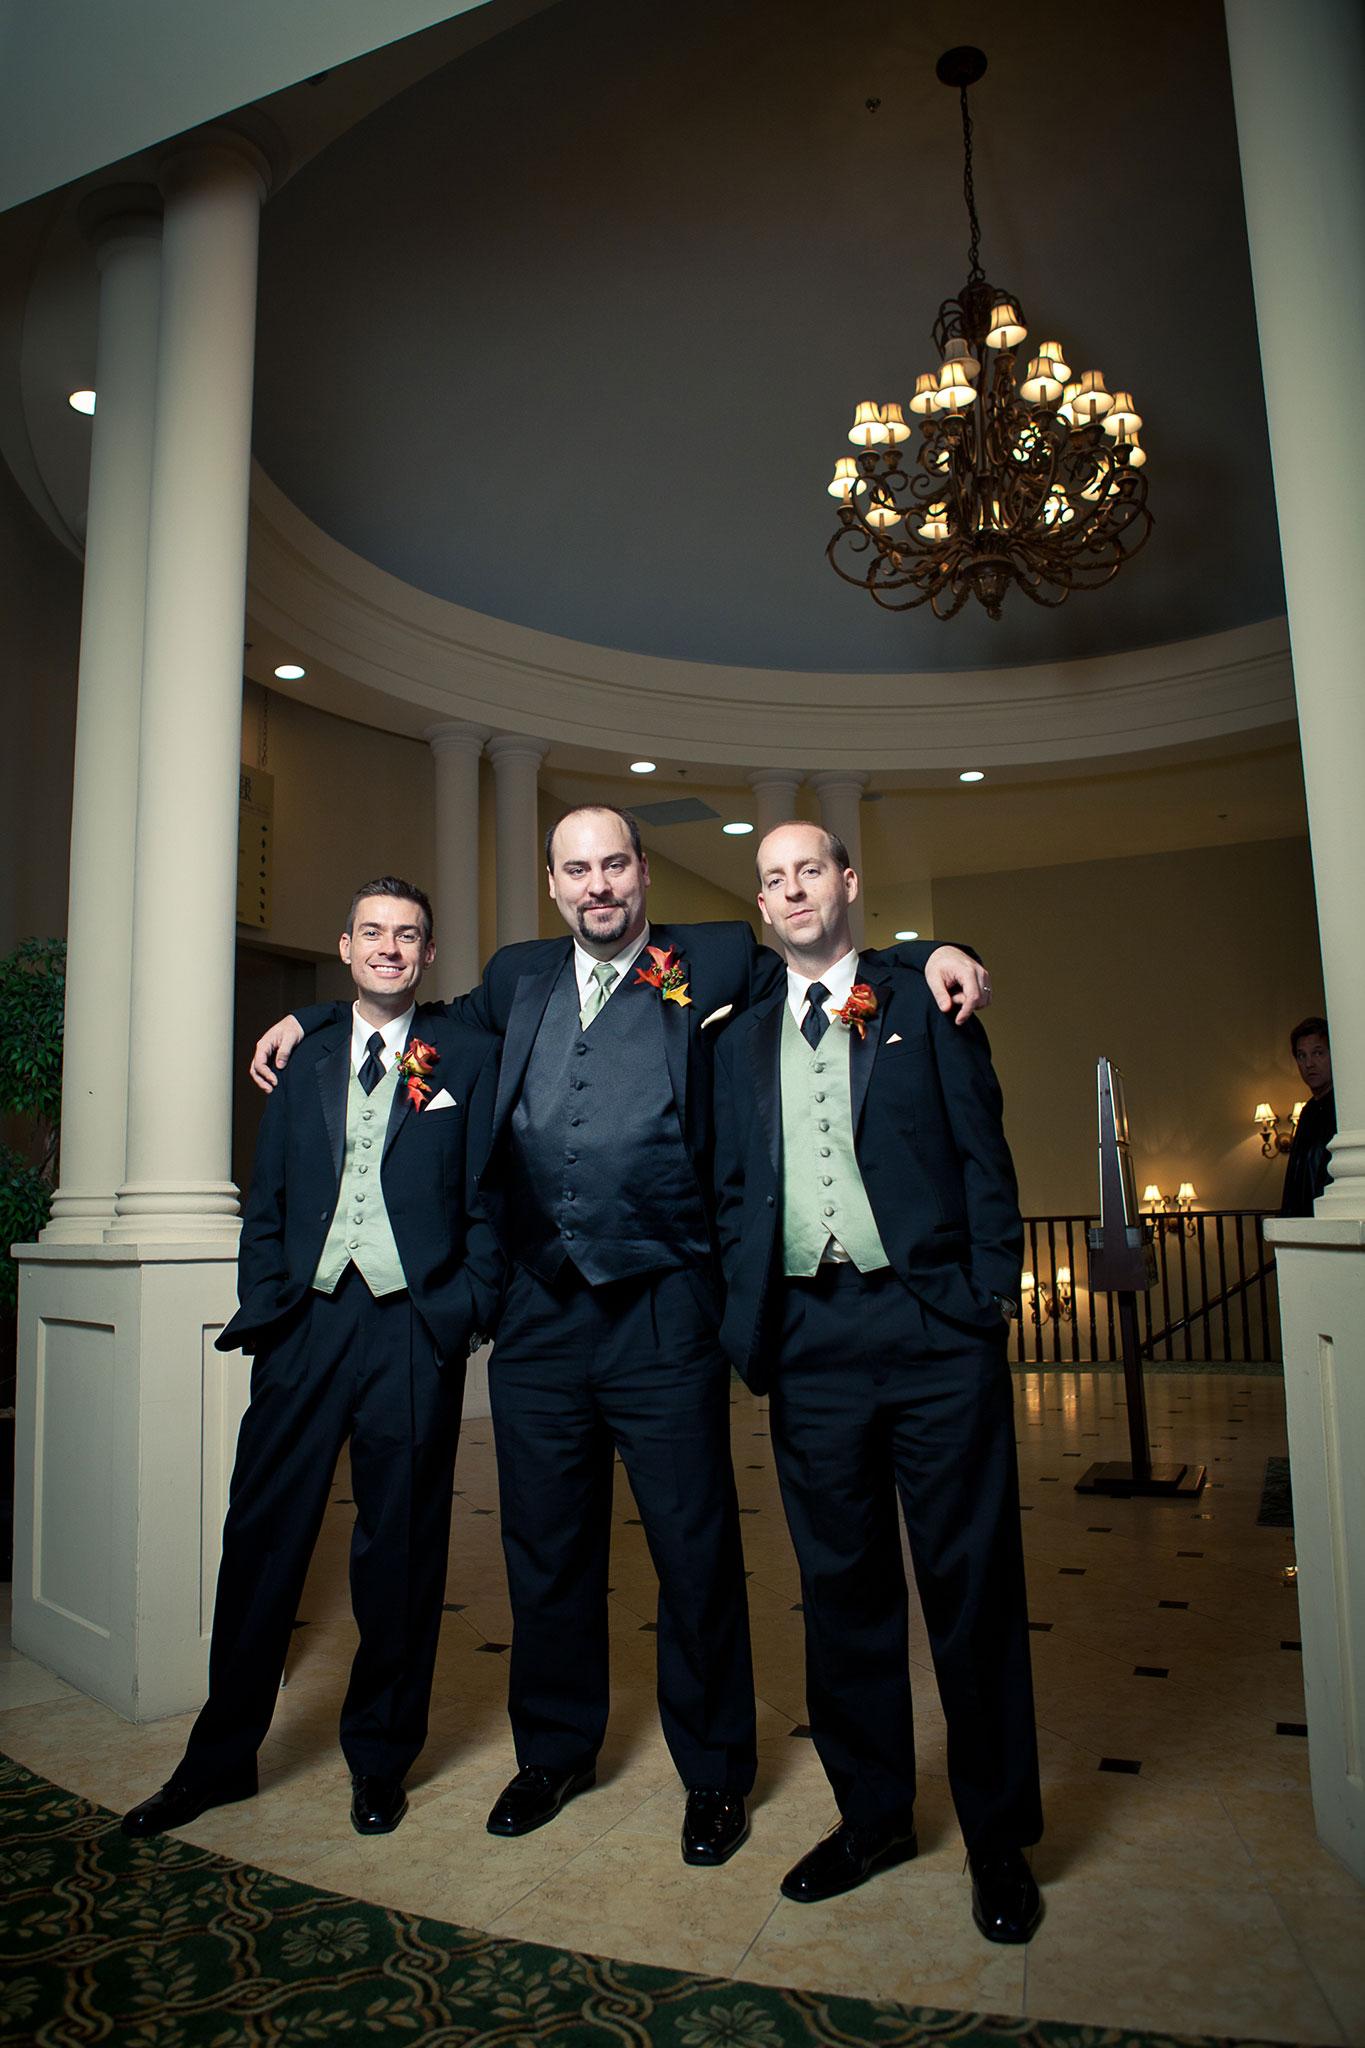 wedding-photographer-toronto-canada-shayne-gray_4294.jpg